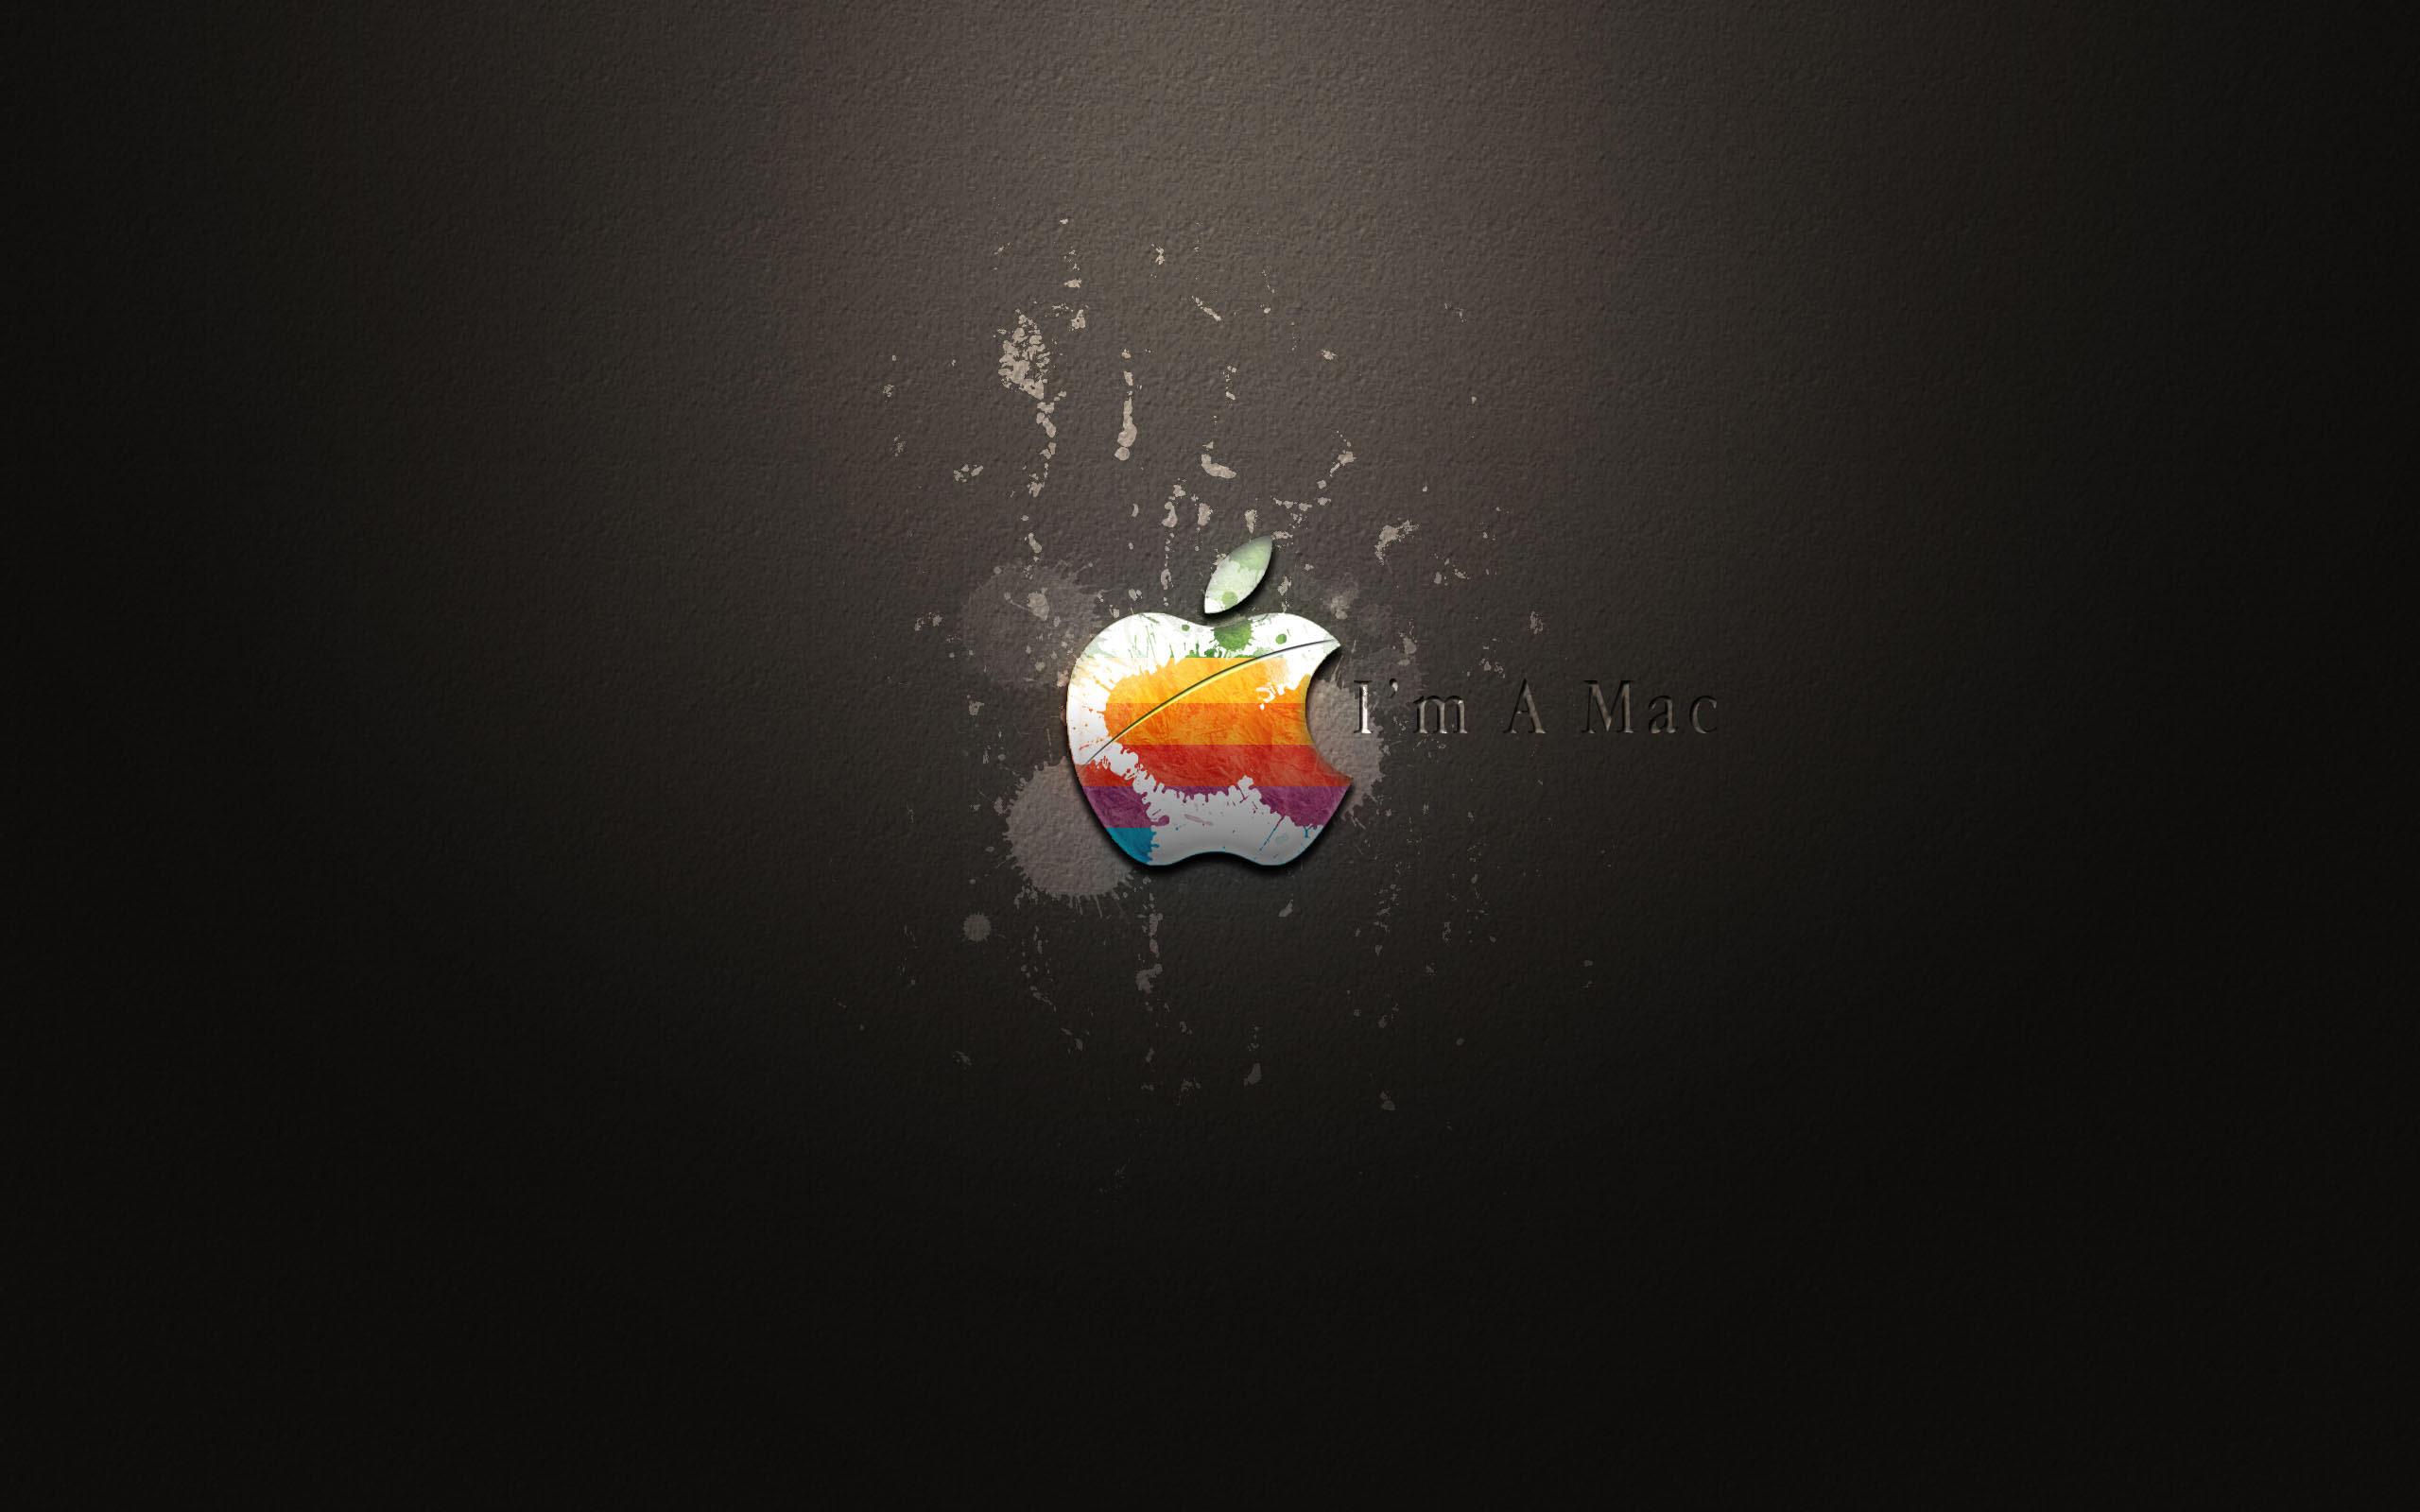 mac wallpapers hd wallpaper 2560x1600